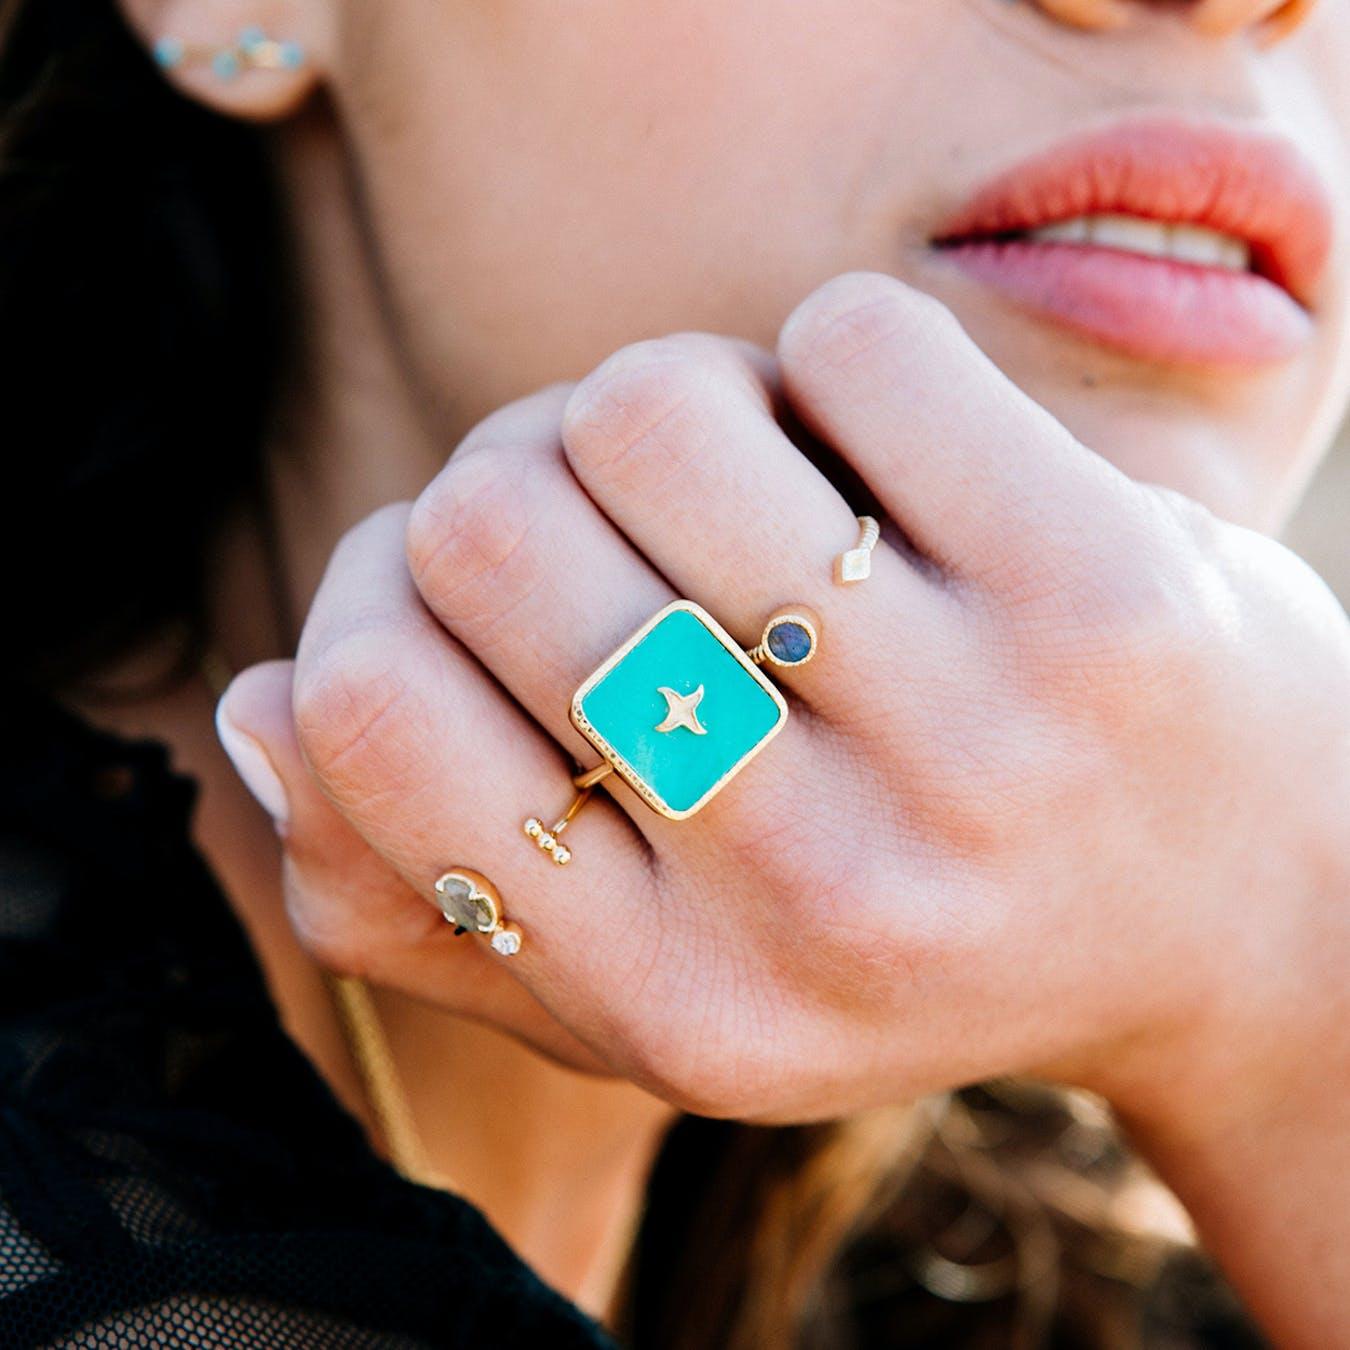 Meruba Ring - Turquoise